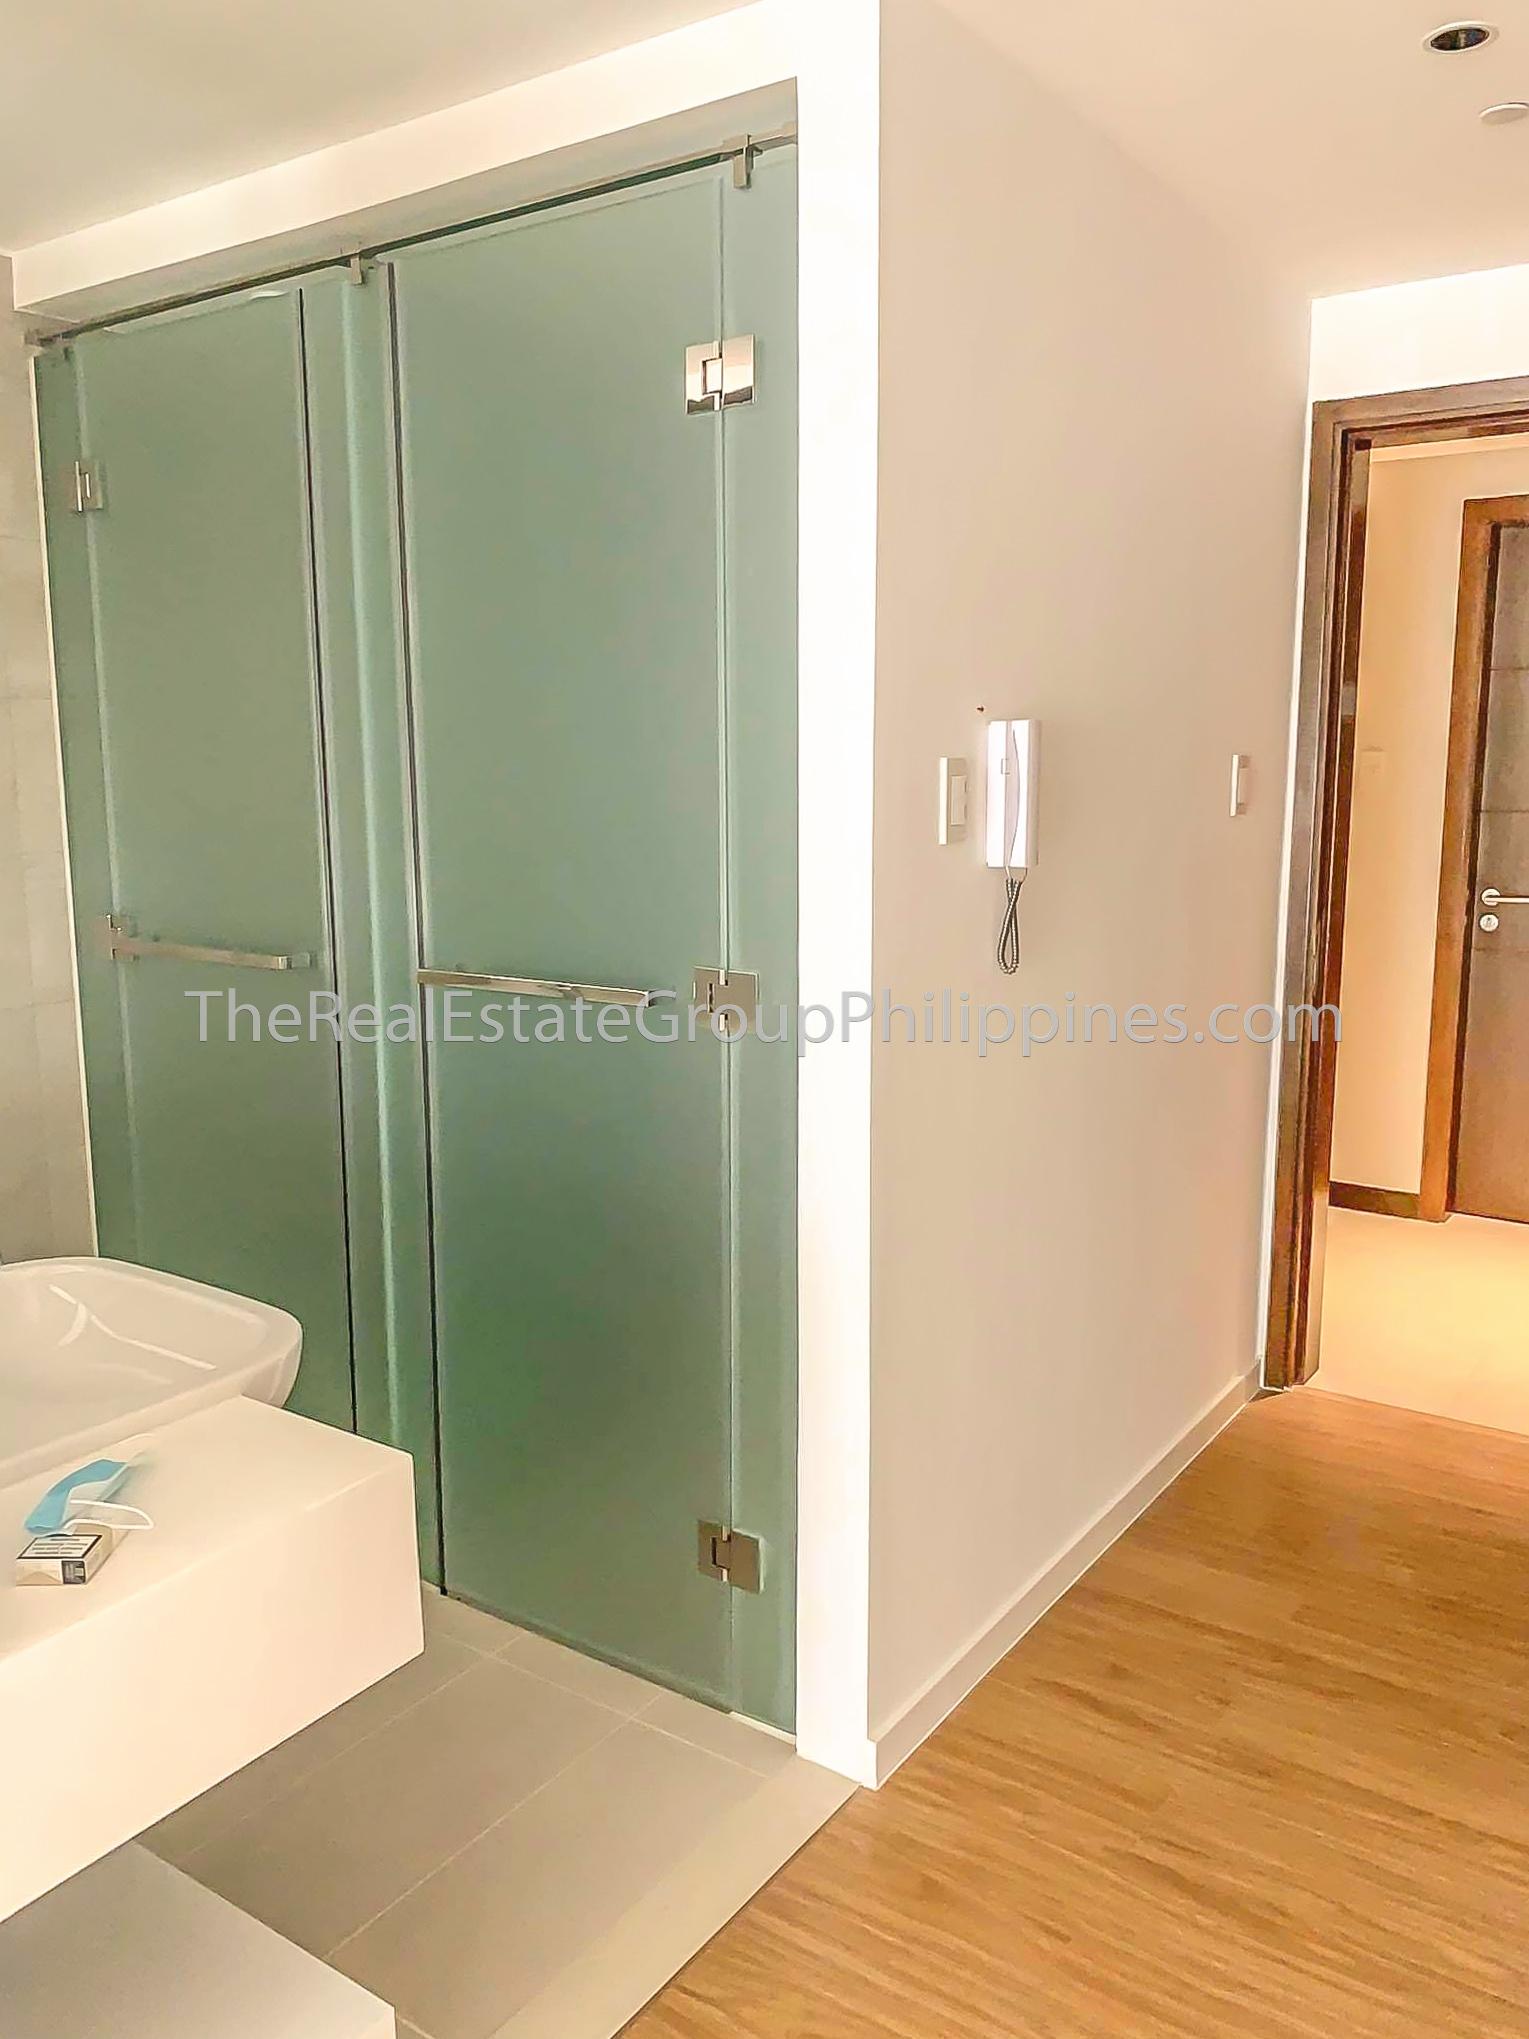 Studio Condo For Sale Novotel Acqua Residences Mandaluyong-3